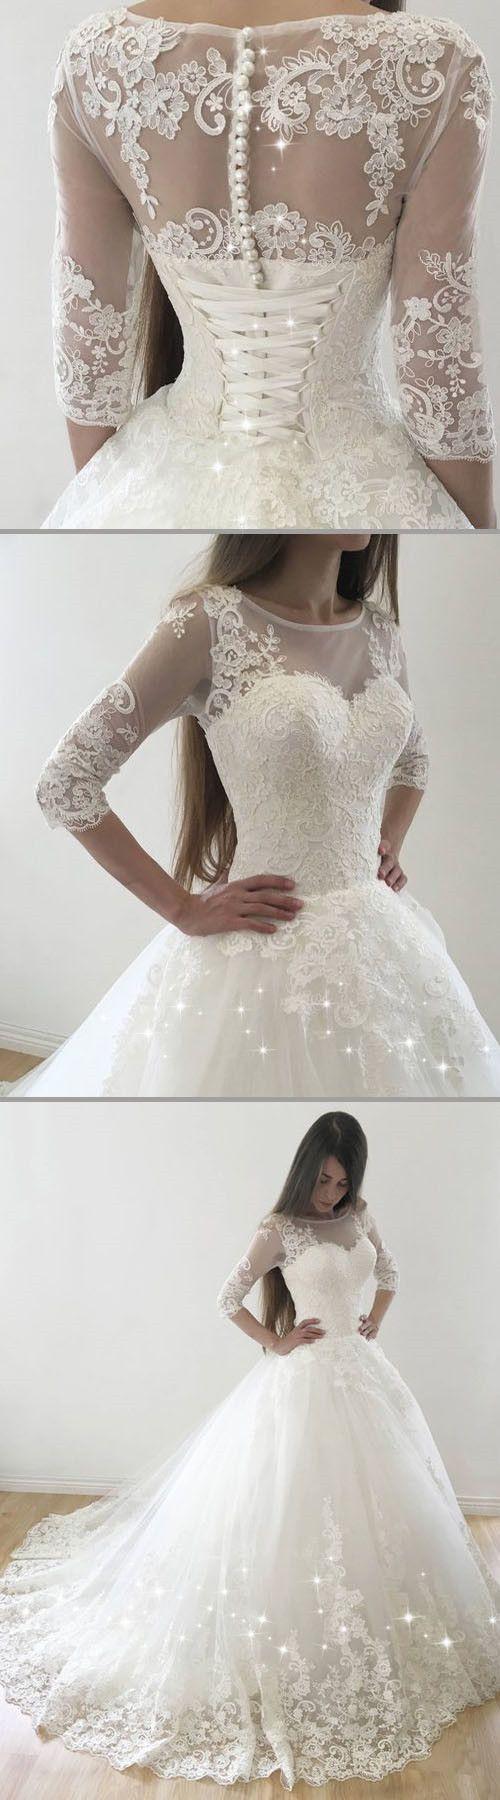 Vintage Tulle Bateau Neckline Ball Gown Wedding Dresses With Lace Appliques